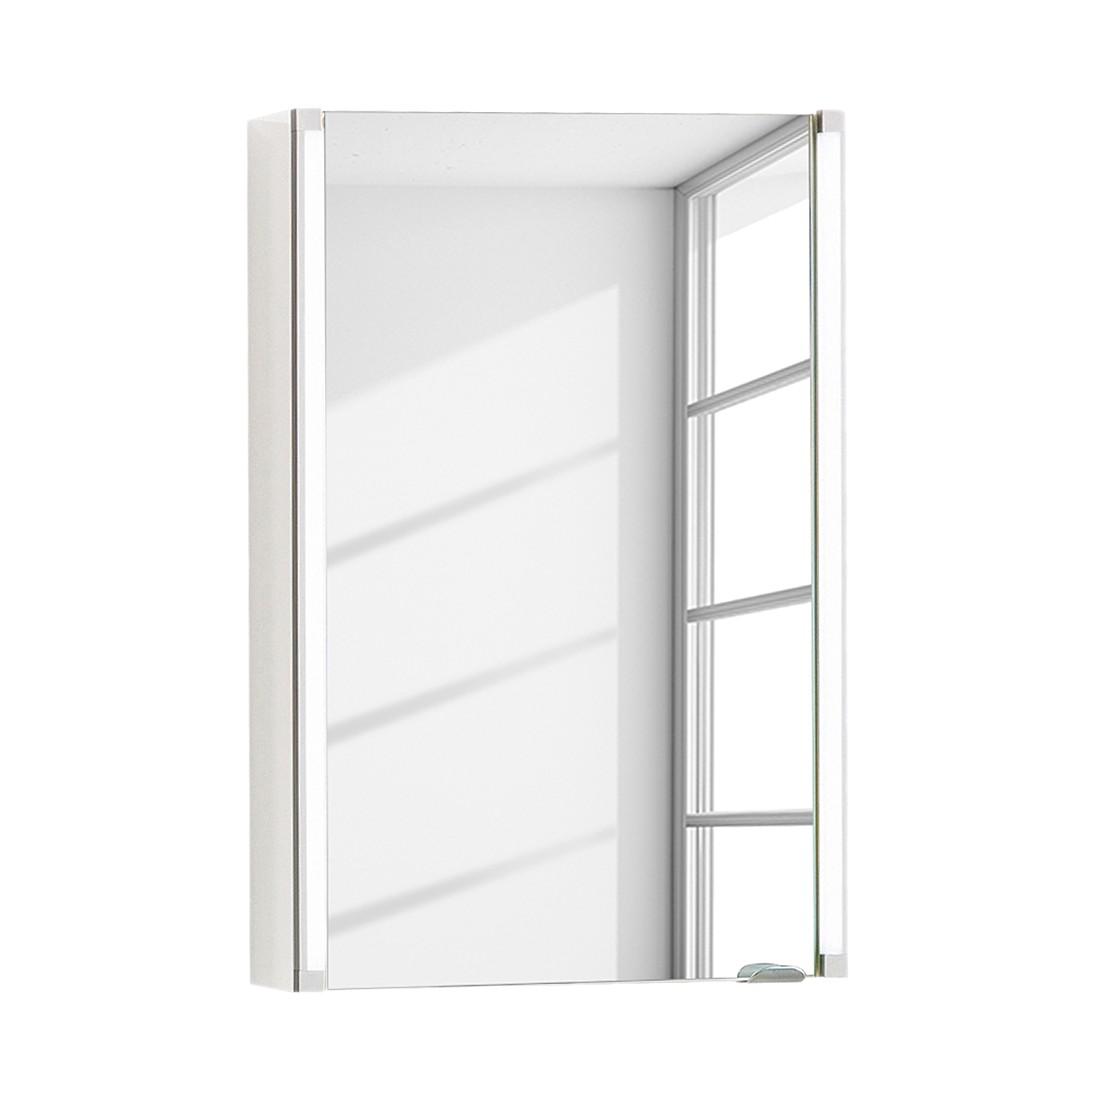 spiegelschrank led line wei 40 cm fackelmann online bestellen. Black Bedroom Furniture Sets. Home Design Ideas